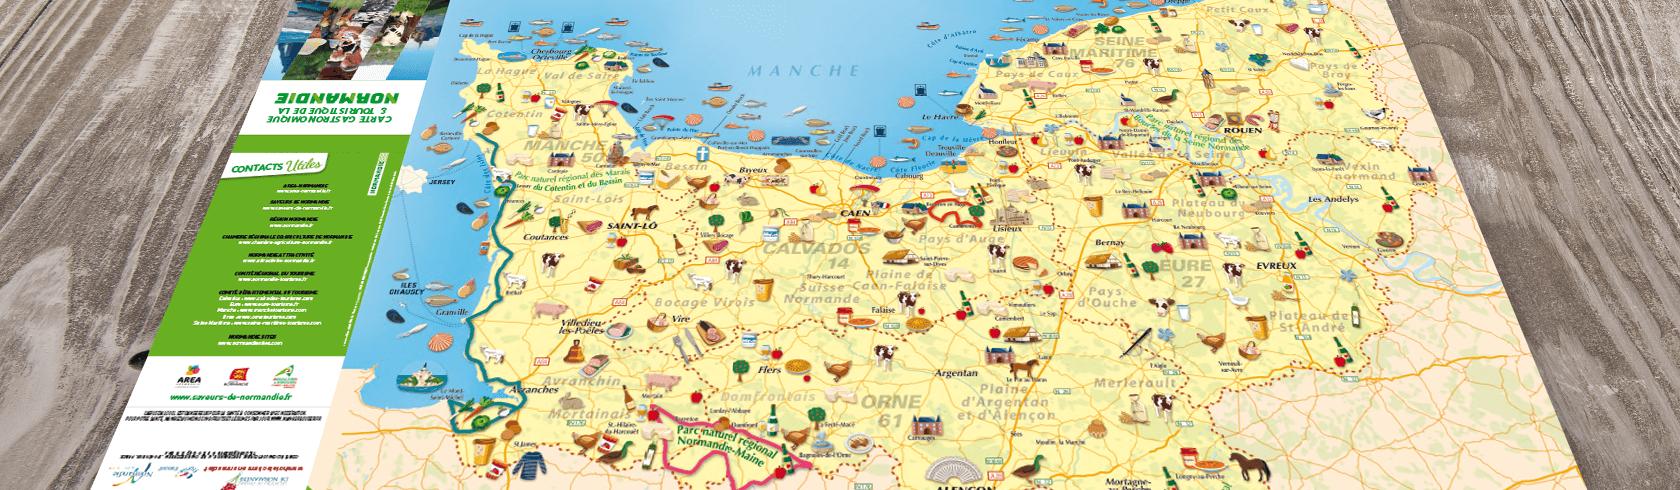 slide-carte-saveurs-normandie